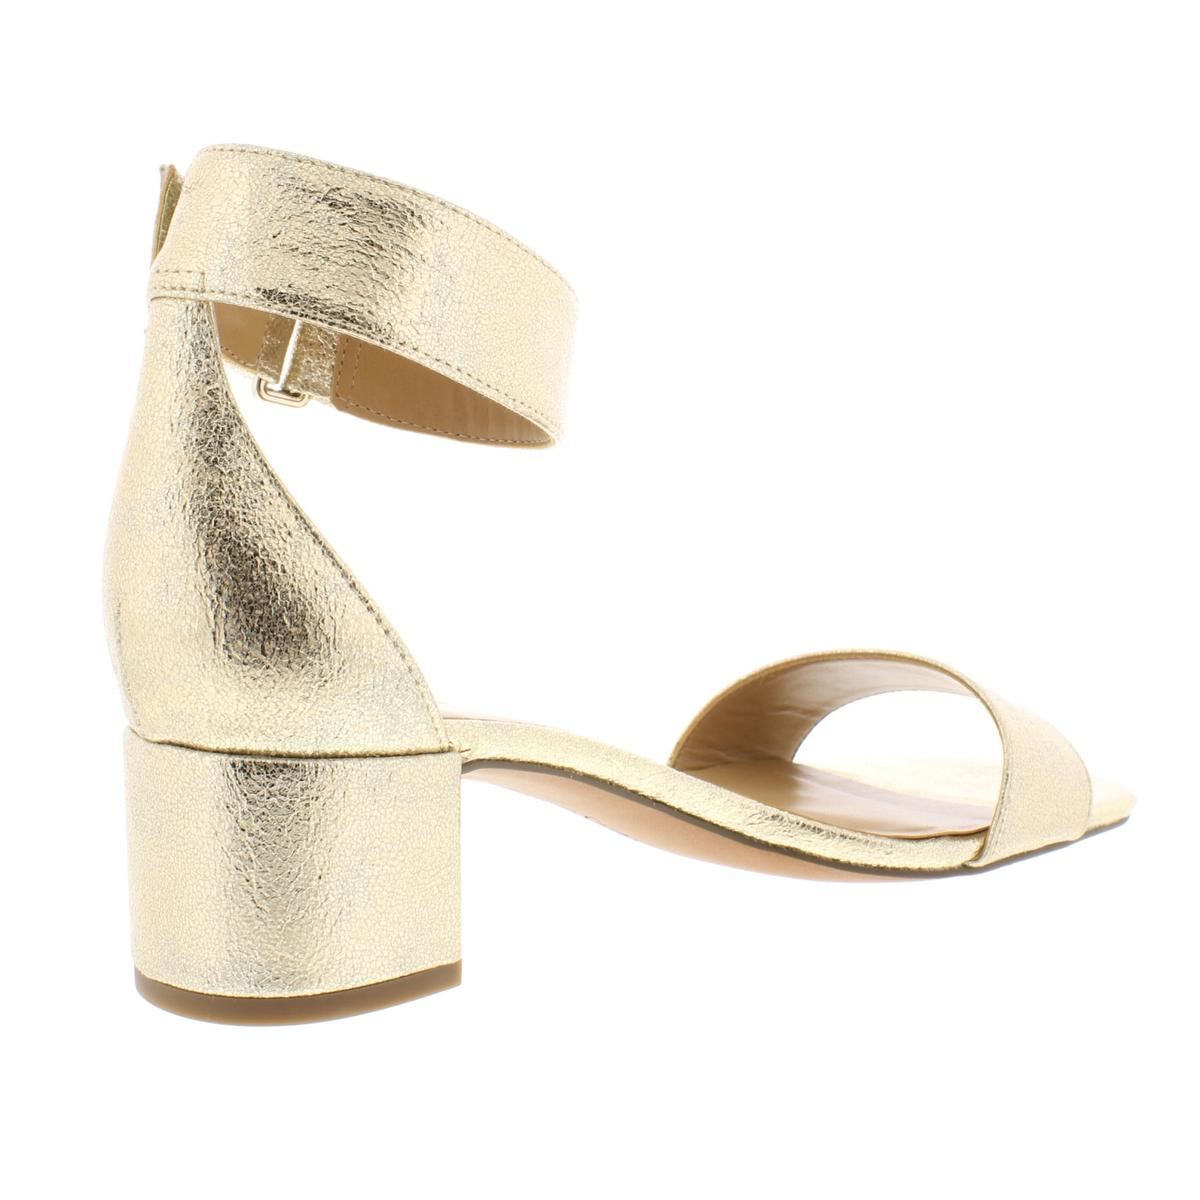 Franco-Sarto-Womens-Rosalina-Solid-Block-Heel-Dress-Sandals-Evening-BHFO-6957 thumbnail 6